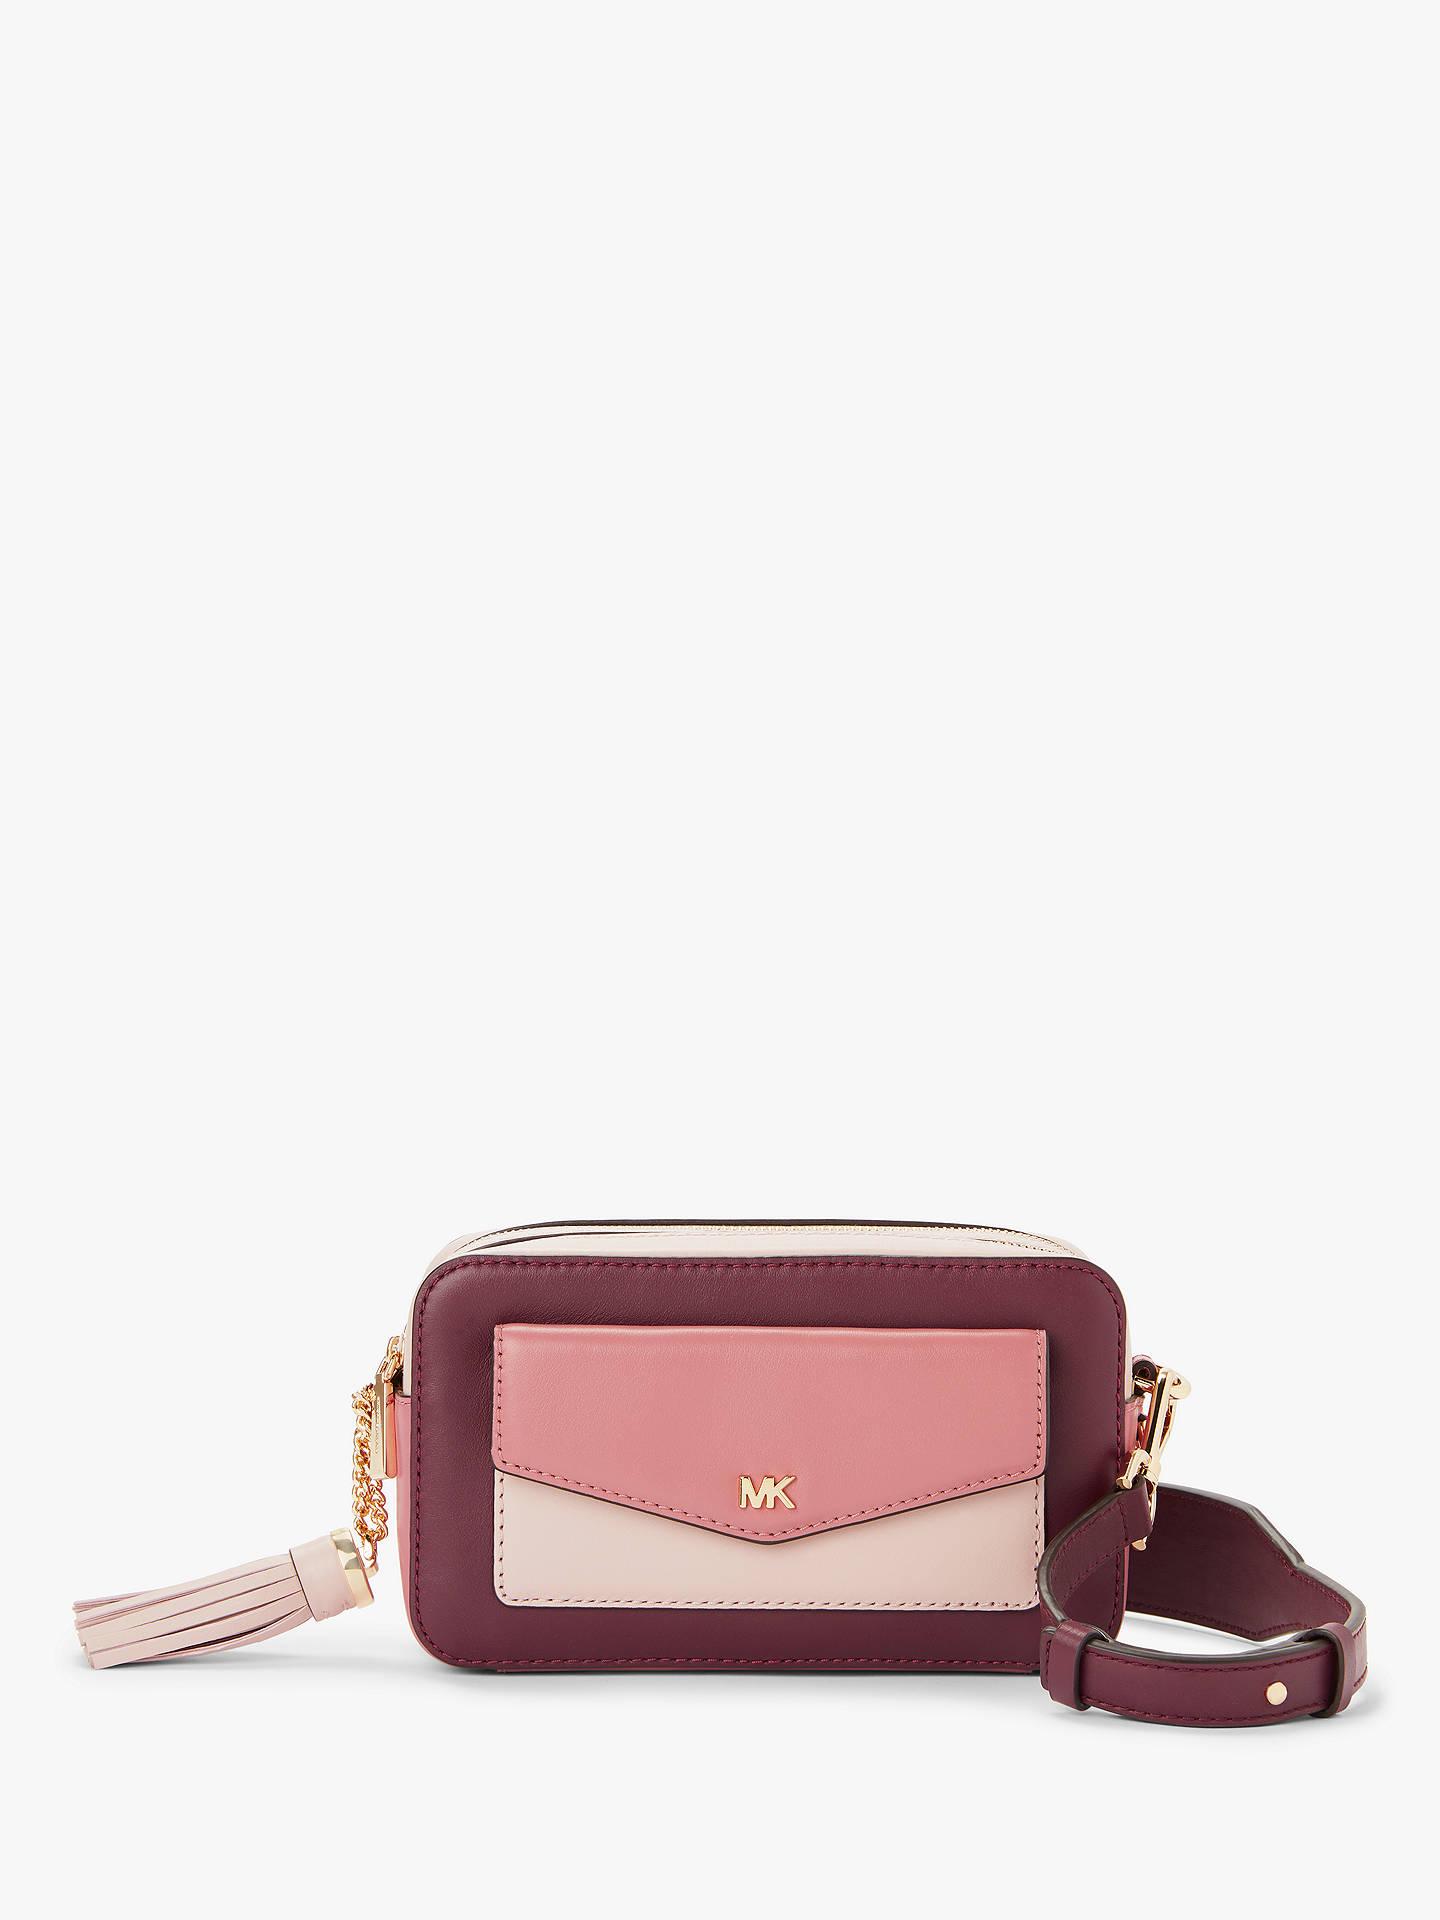 0cfb069c93cf Buy Michael Kors Crossbodies Small Leather Camera Bag